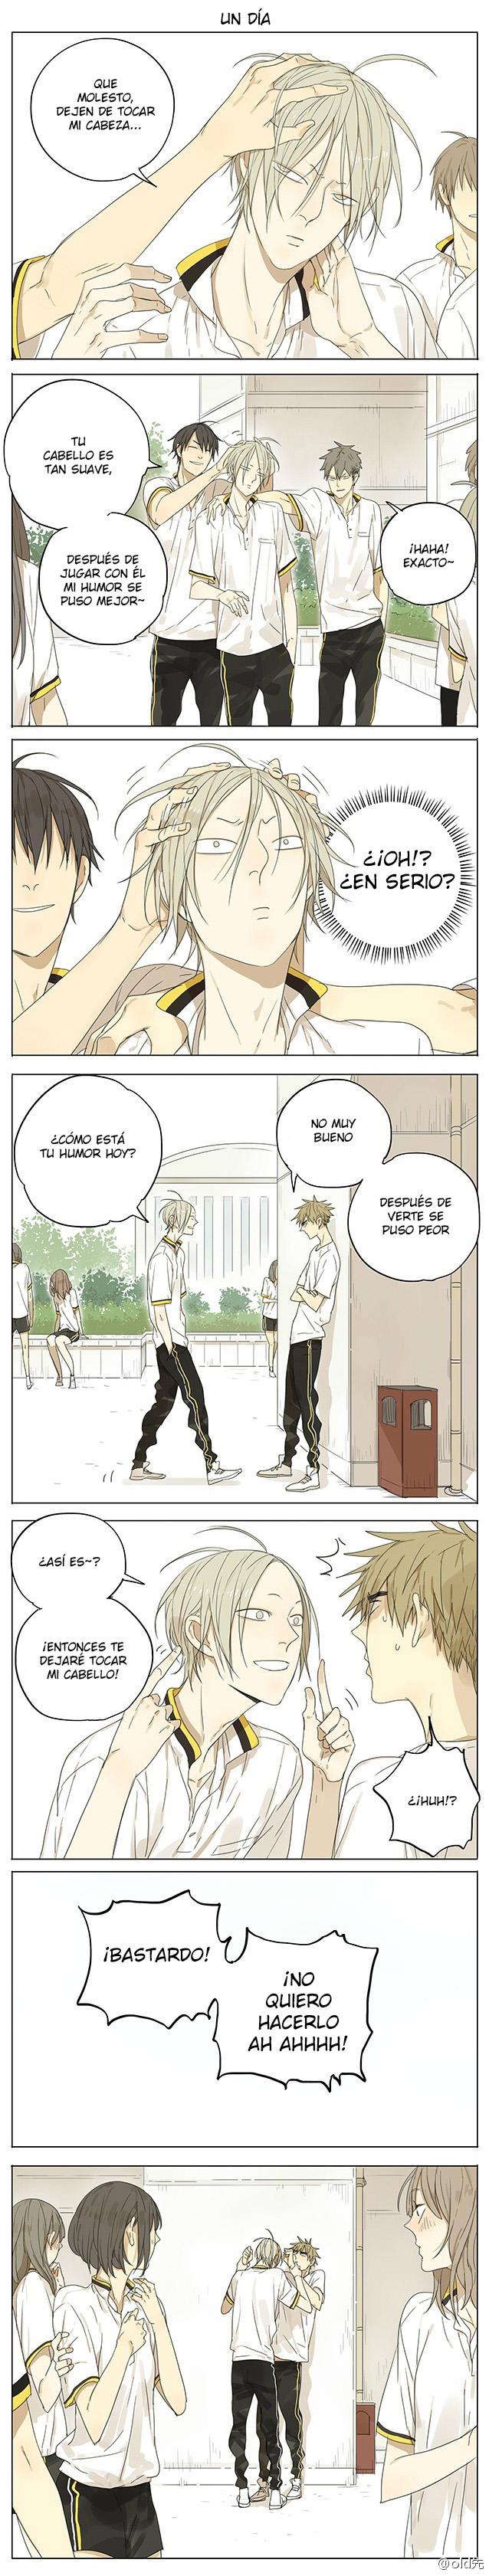 https://c5.ninemanga.com/es_manga/7/15943/381022/cce15eb09da475e89d01b8a853f947f7.jpg Page 1